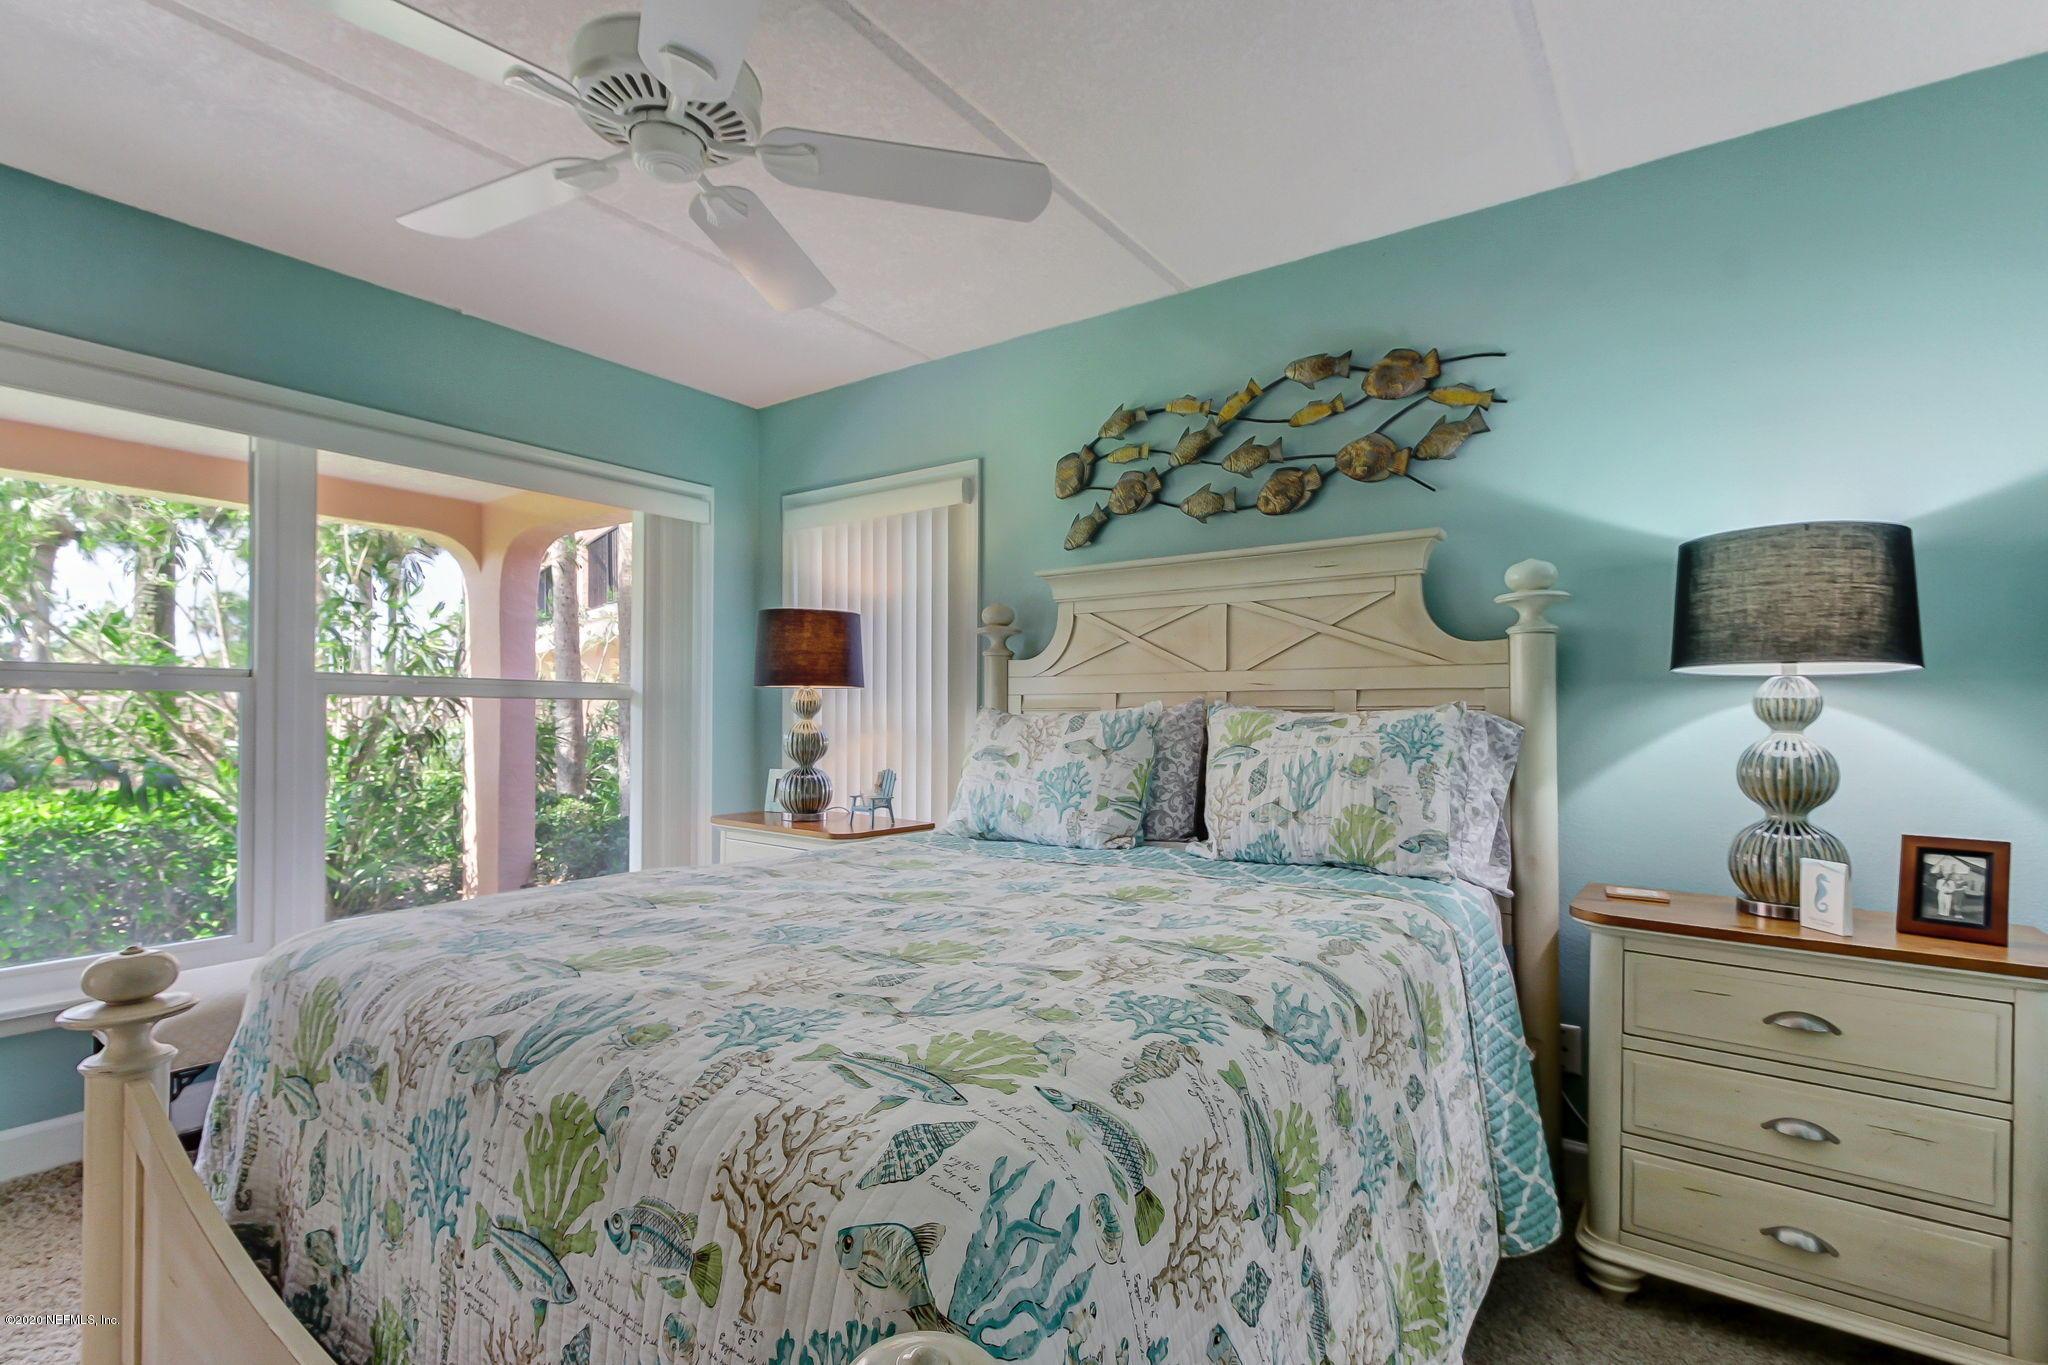 1733 SEA FAIR, ST AUGUSTINE, FLORIDA 32080, 2 Bedrooms Bedrooms, ,2 BathroomsBathrooms,Residential,For sale,SEA FAIR,1057055